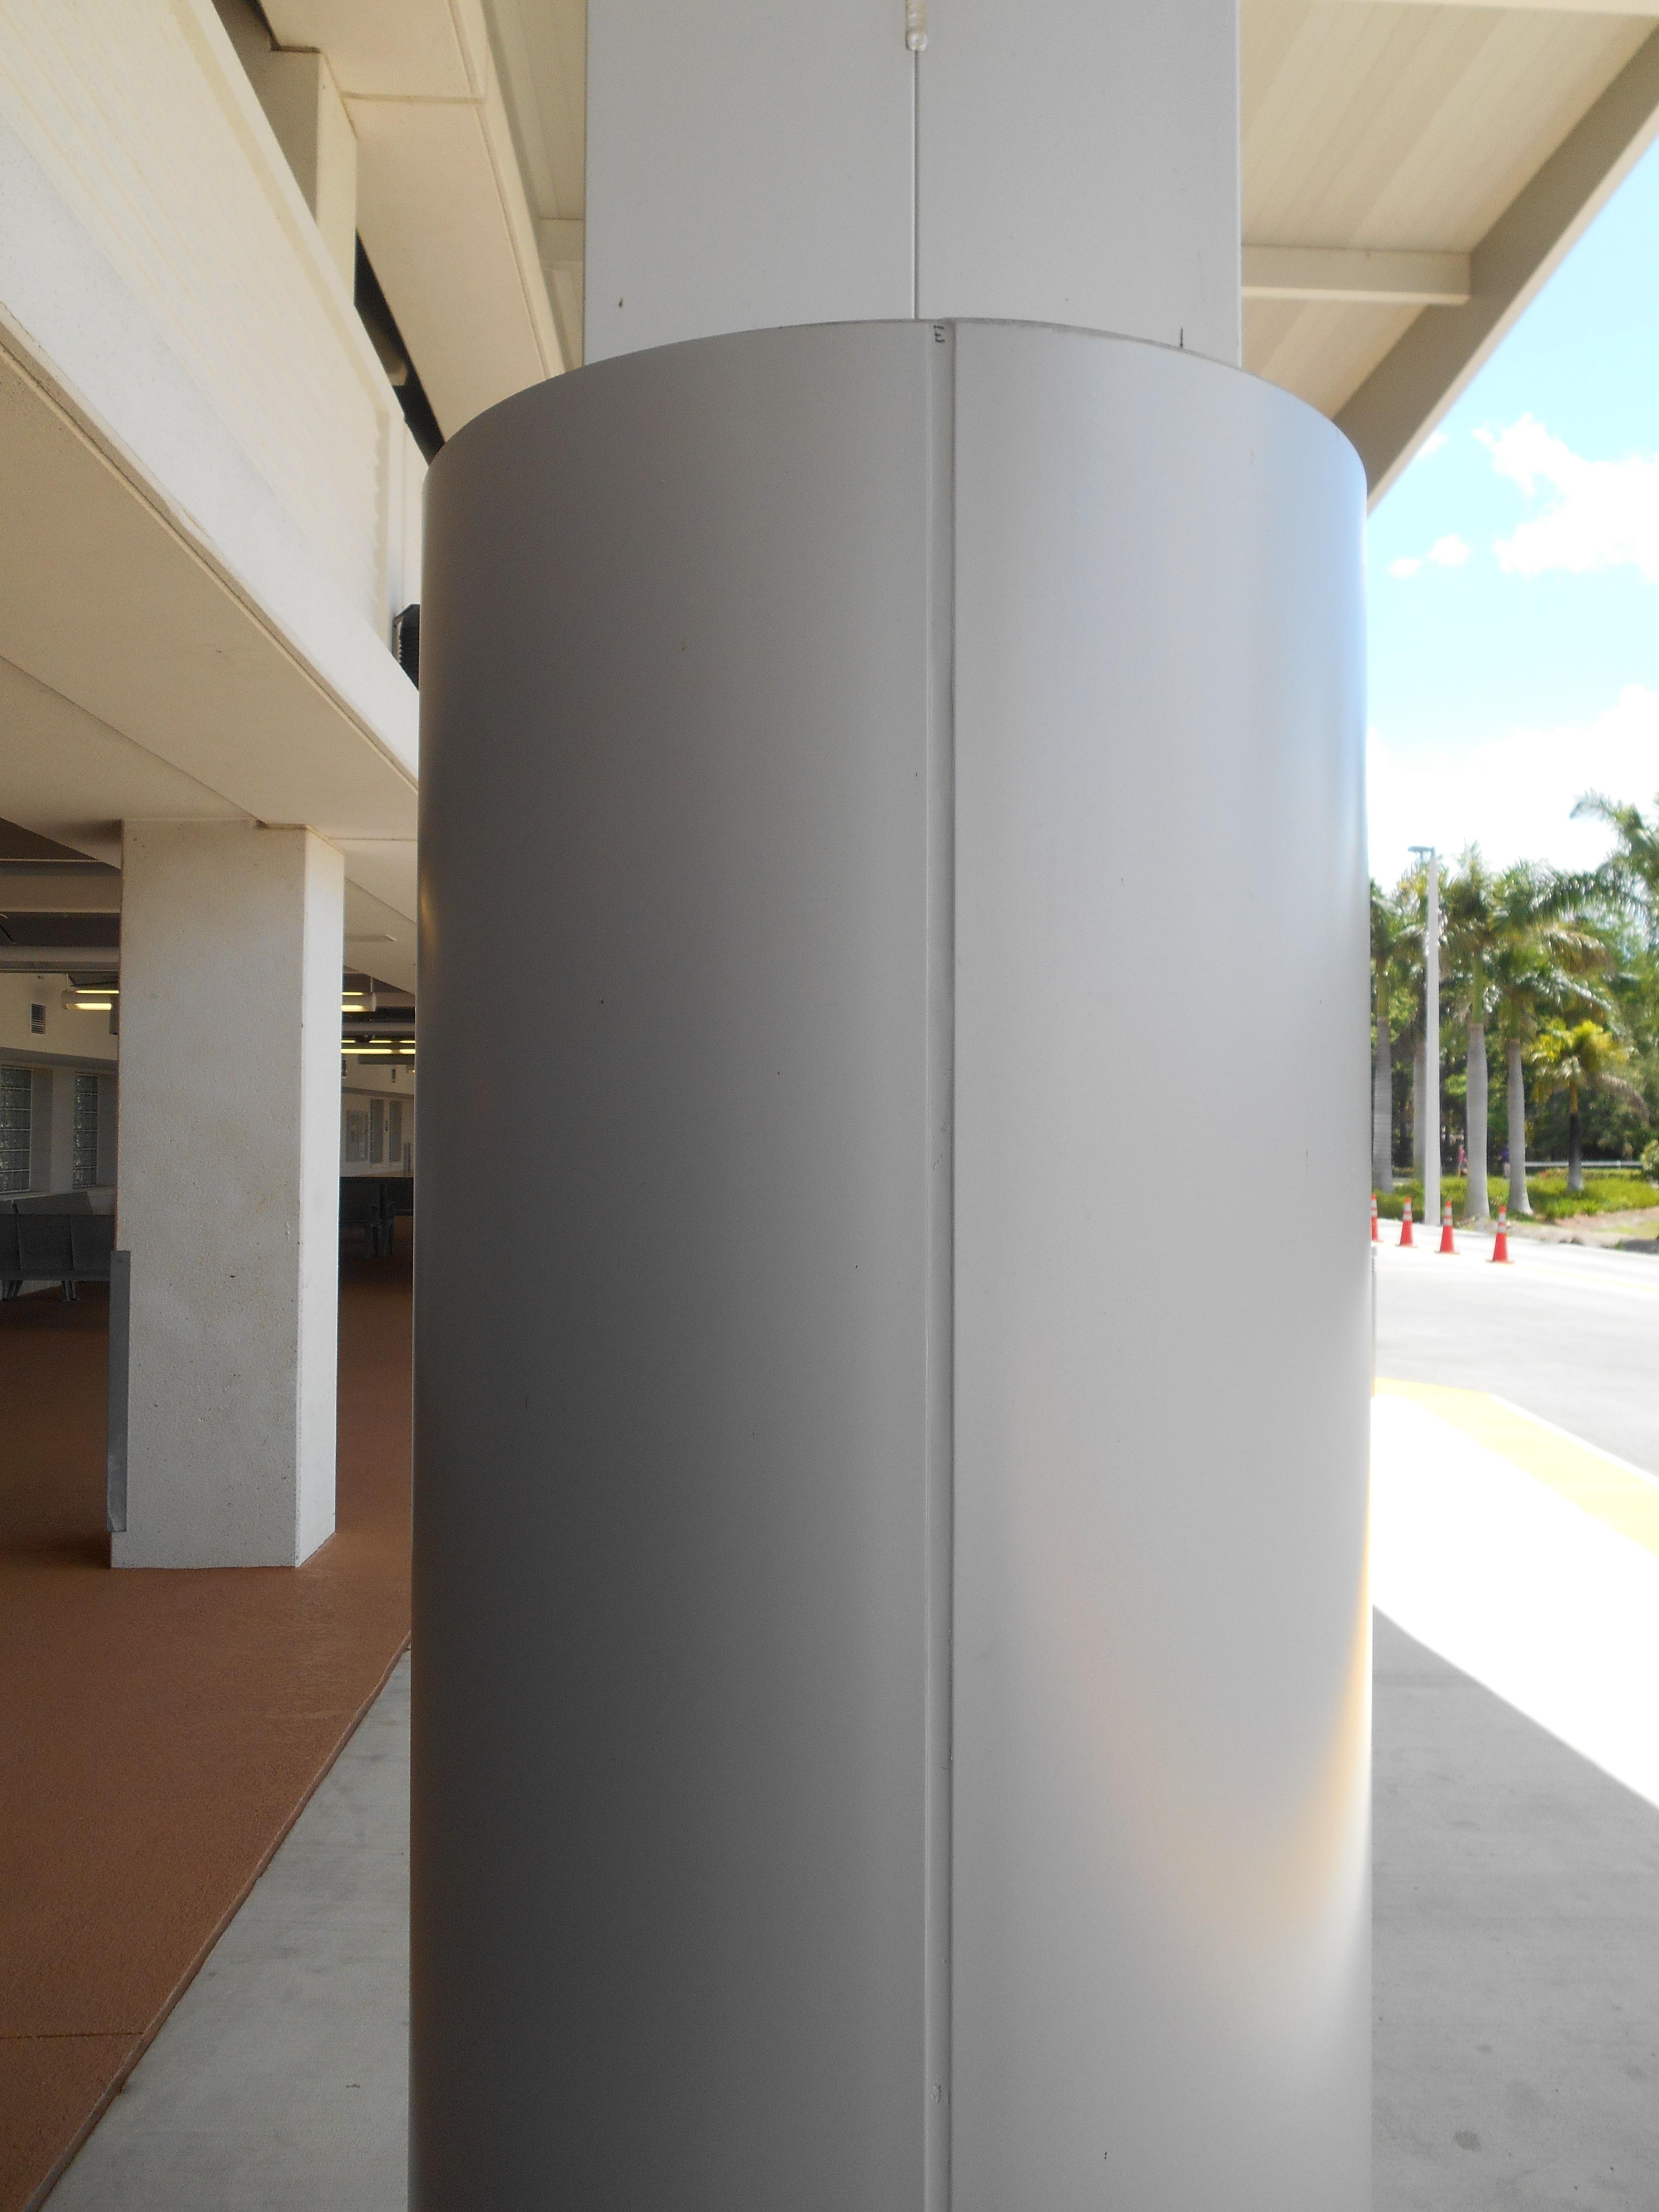 Image Result For Decorative Column Wraps